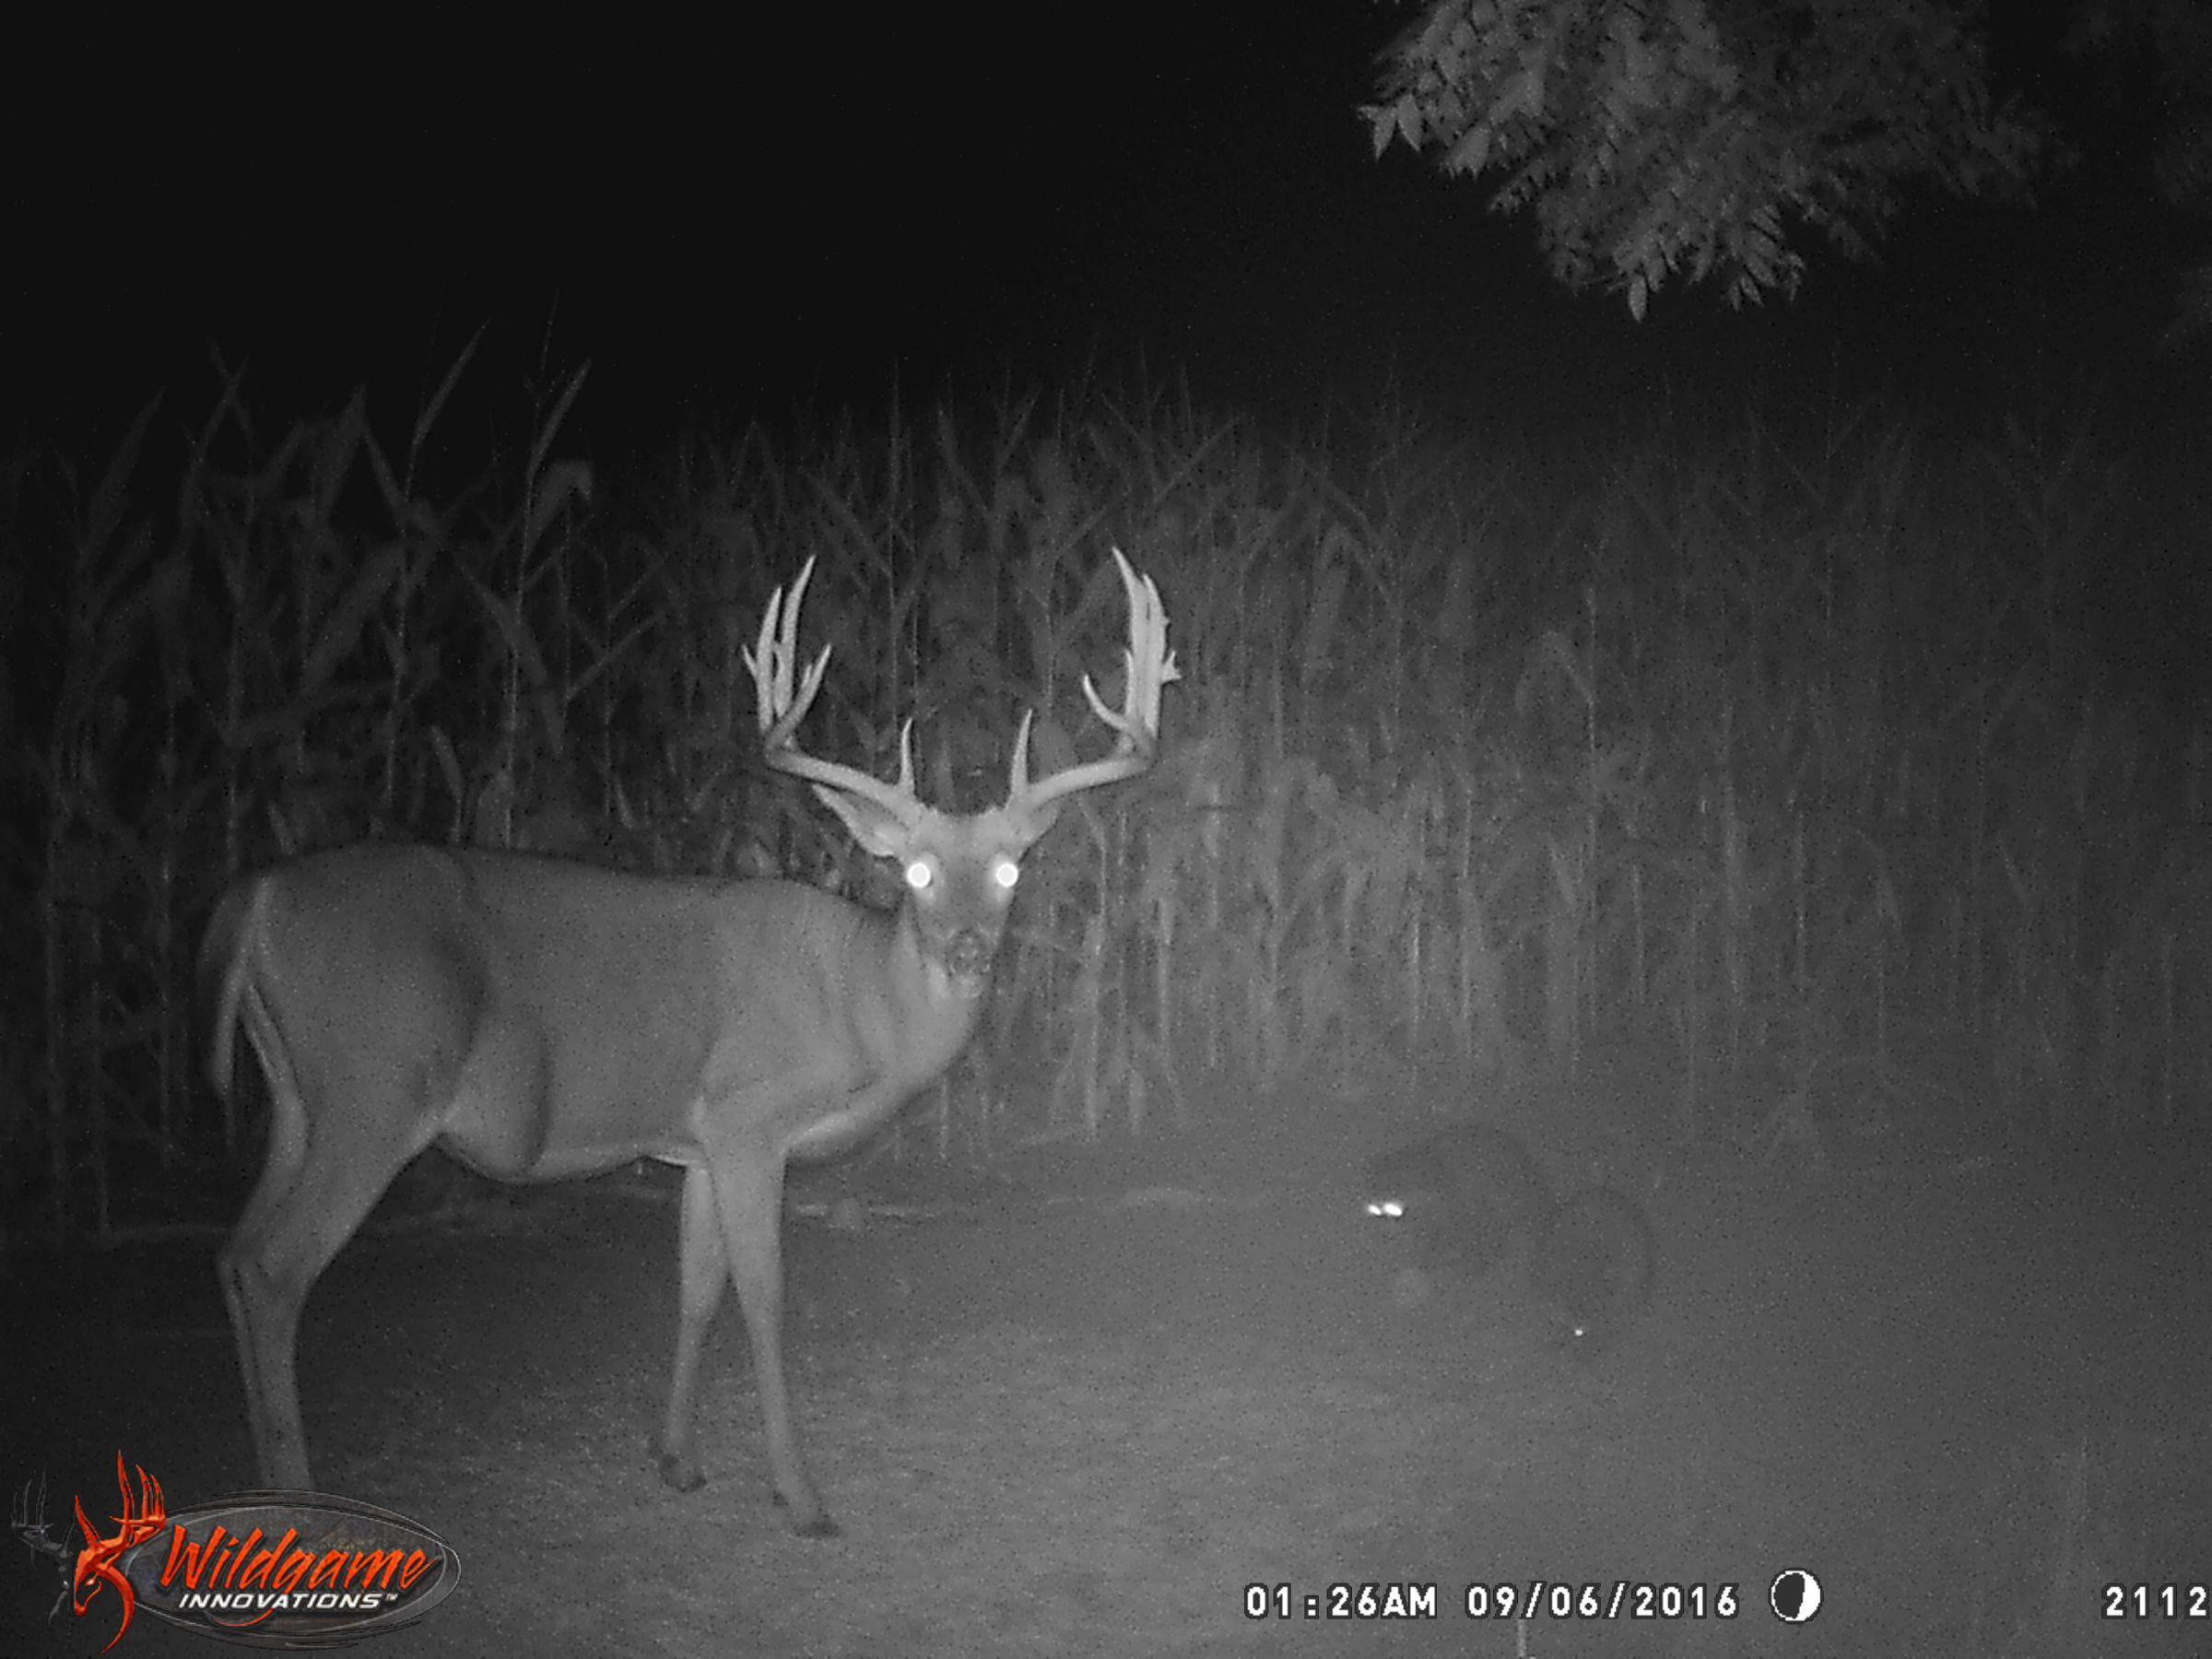 land-clarke-county-iowa-325-acres-listing-number-15416-12-2021-03-19-165620.jpg